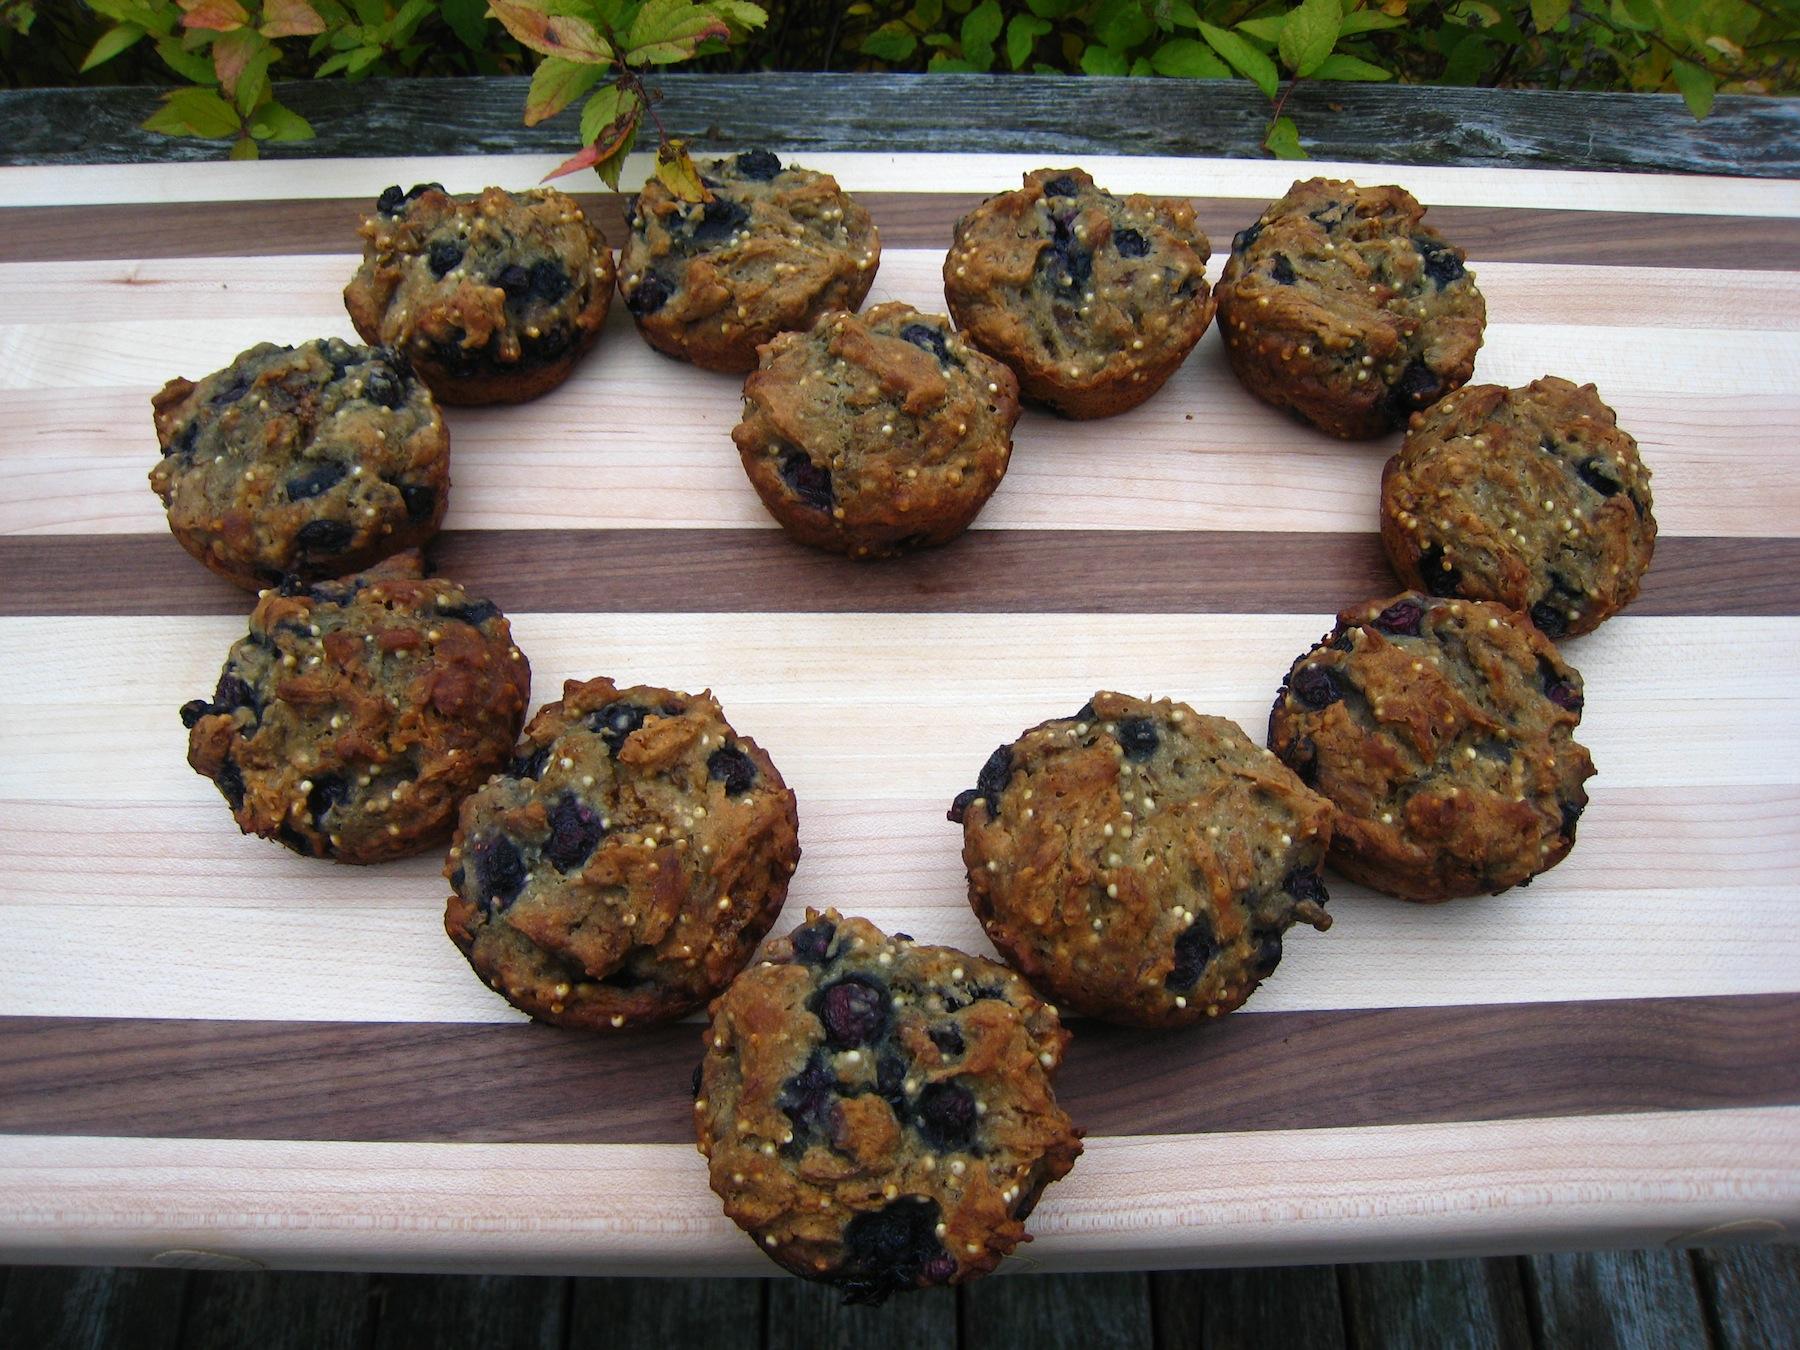 Banana Blueberry Walnut Muffins (gluten-free & dairy-free)